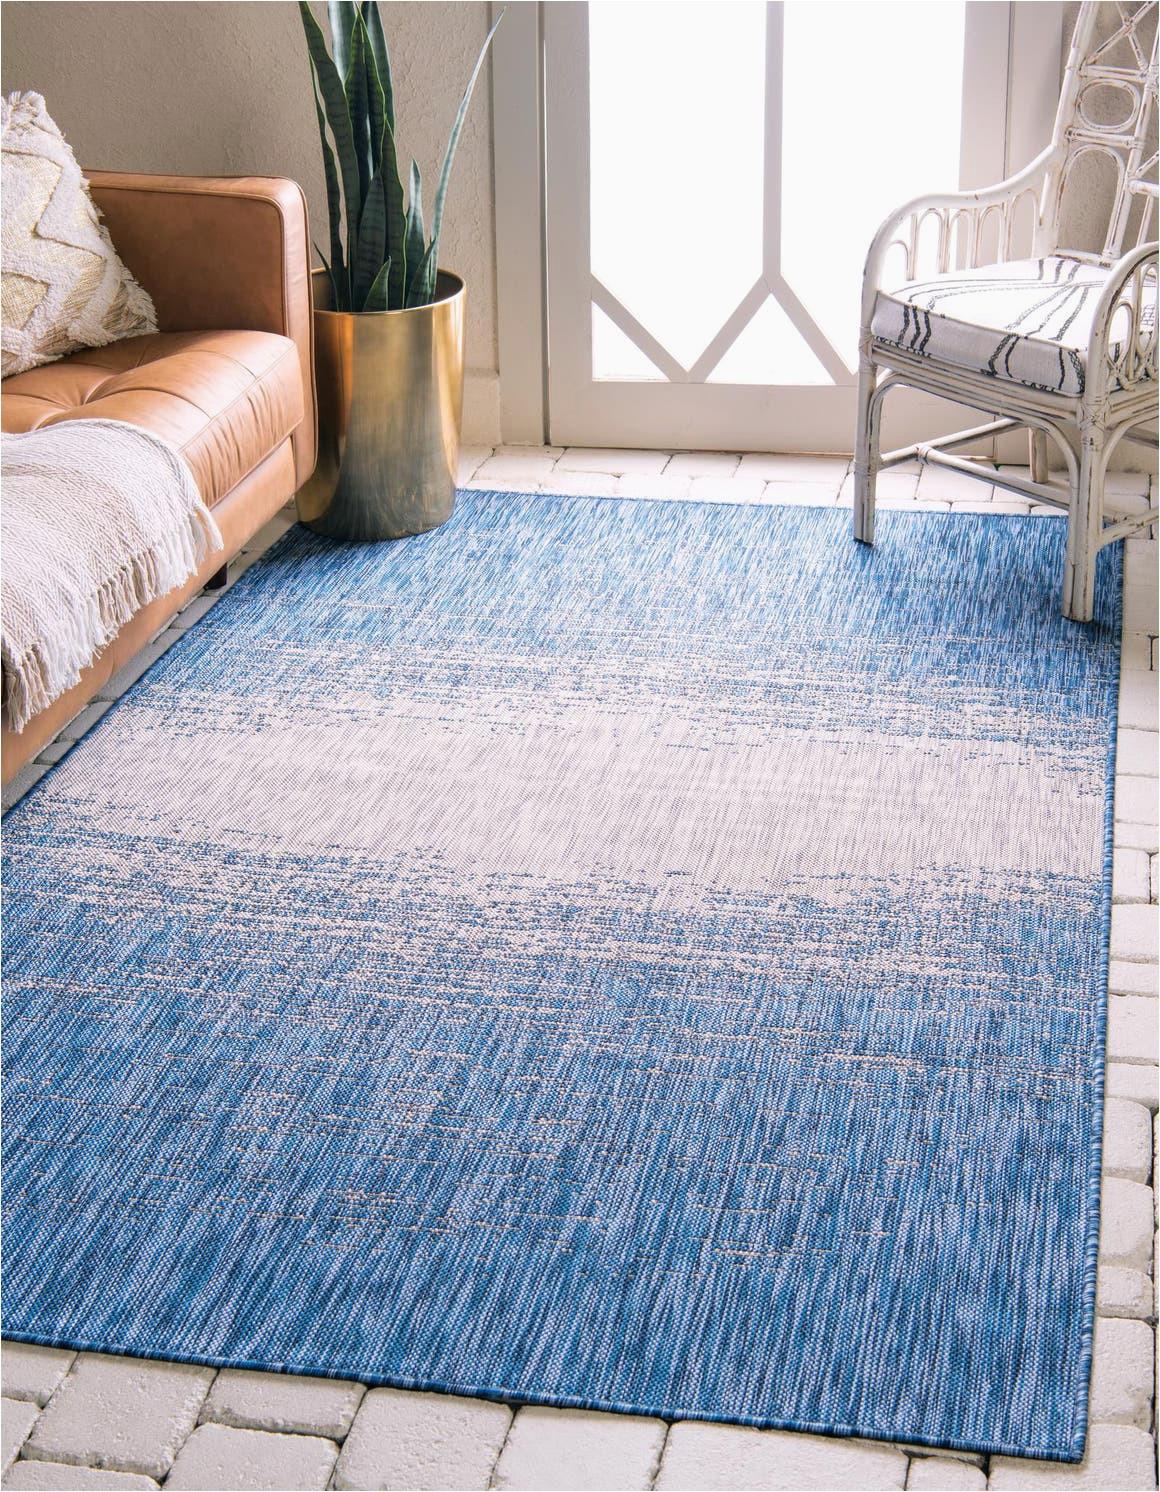 blue 4x6 outdoor modern area rug